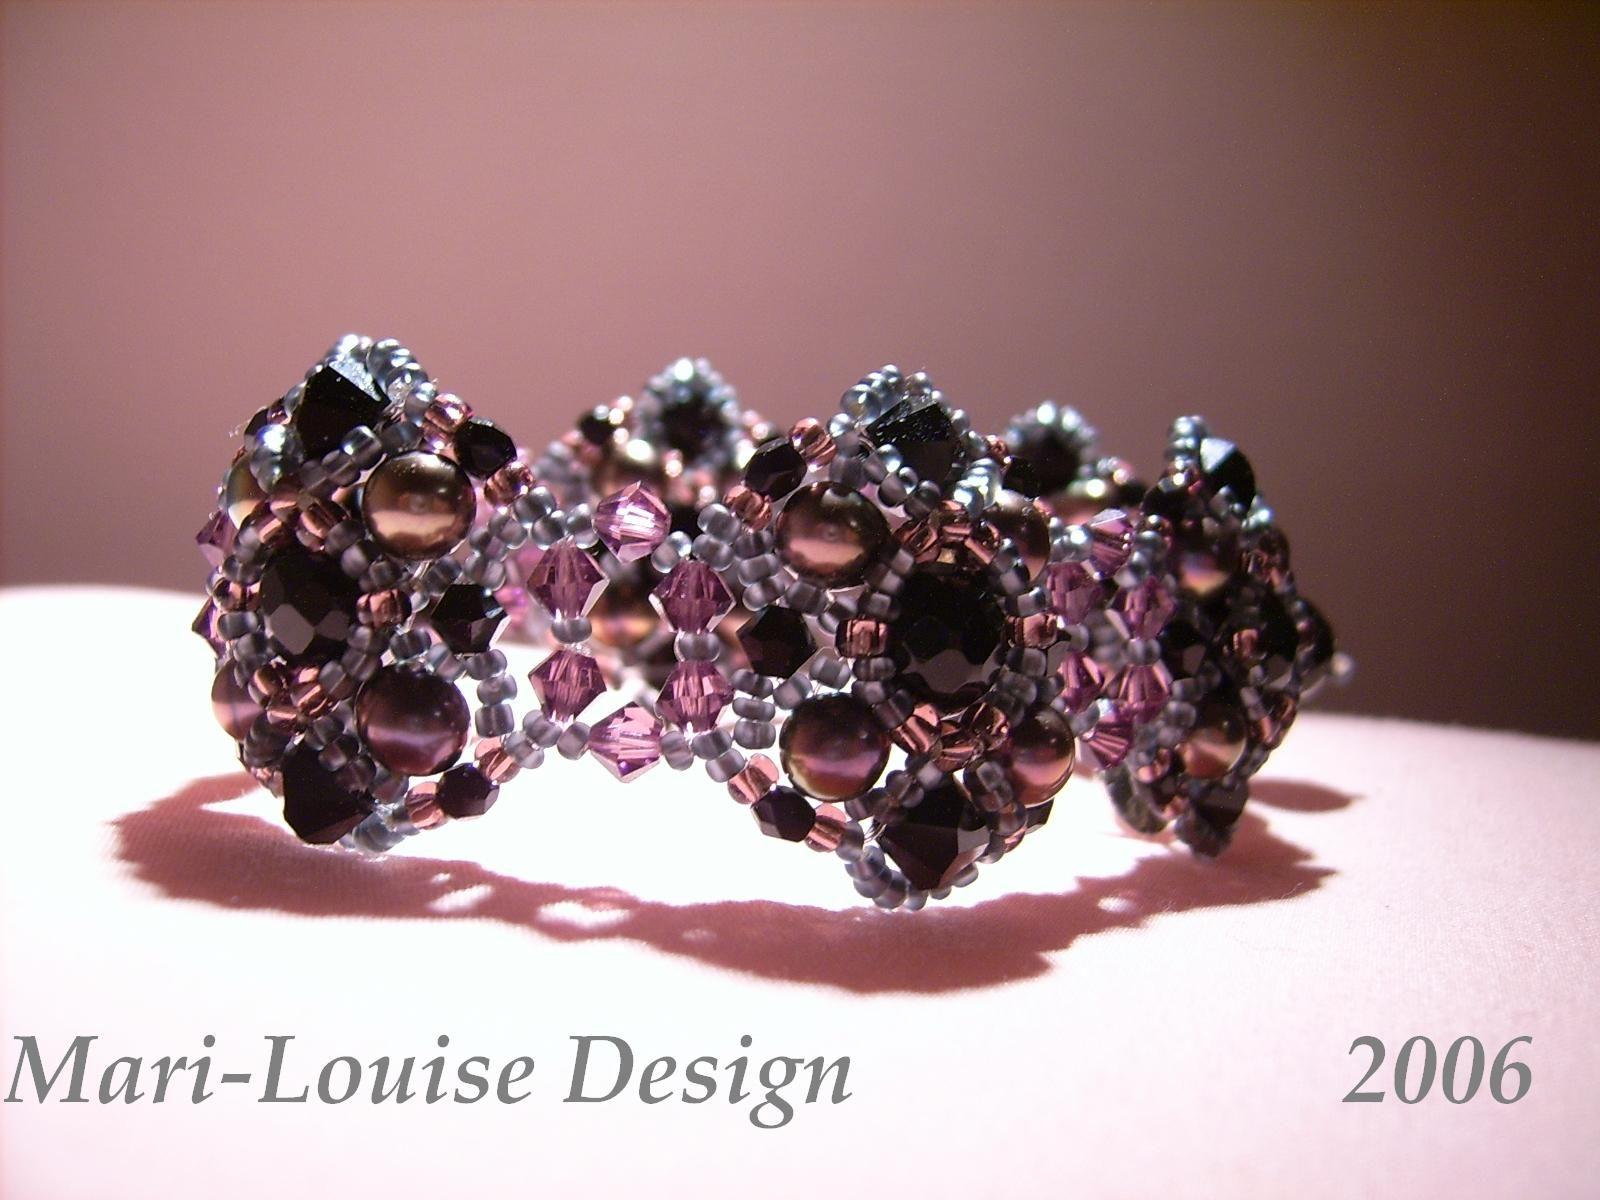 Bracelet of sweetwaterpearls, Swarovski and black onyx.